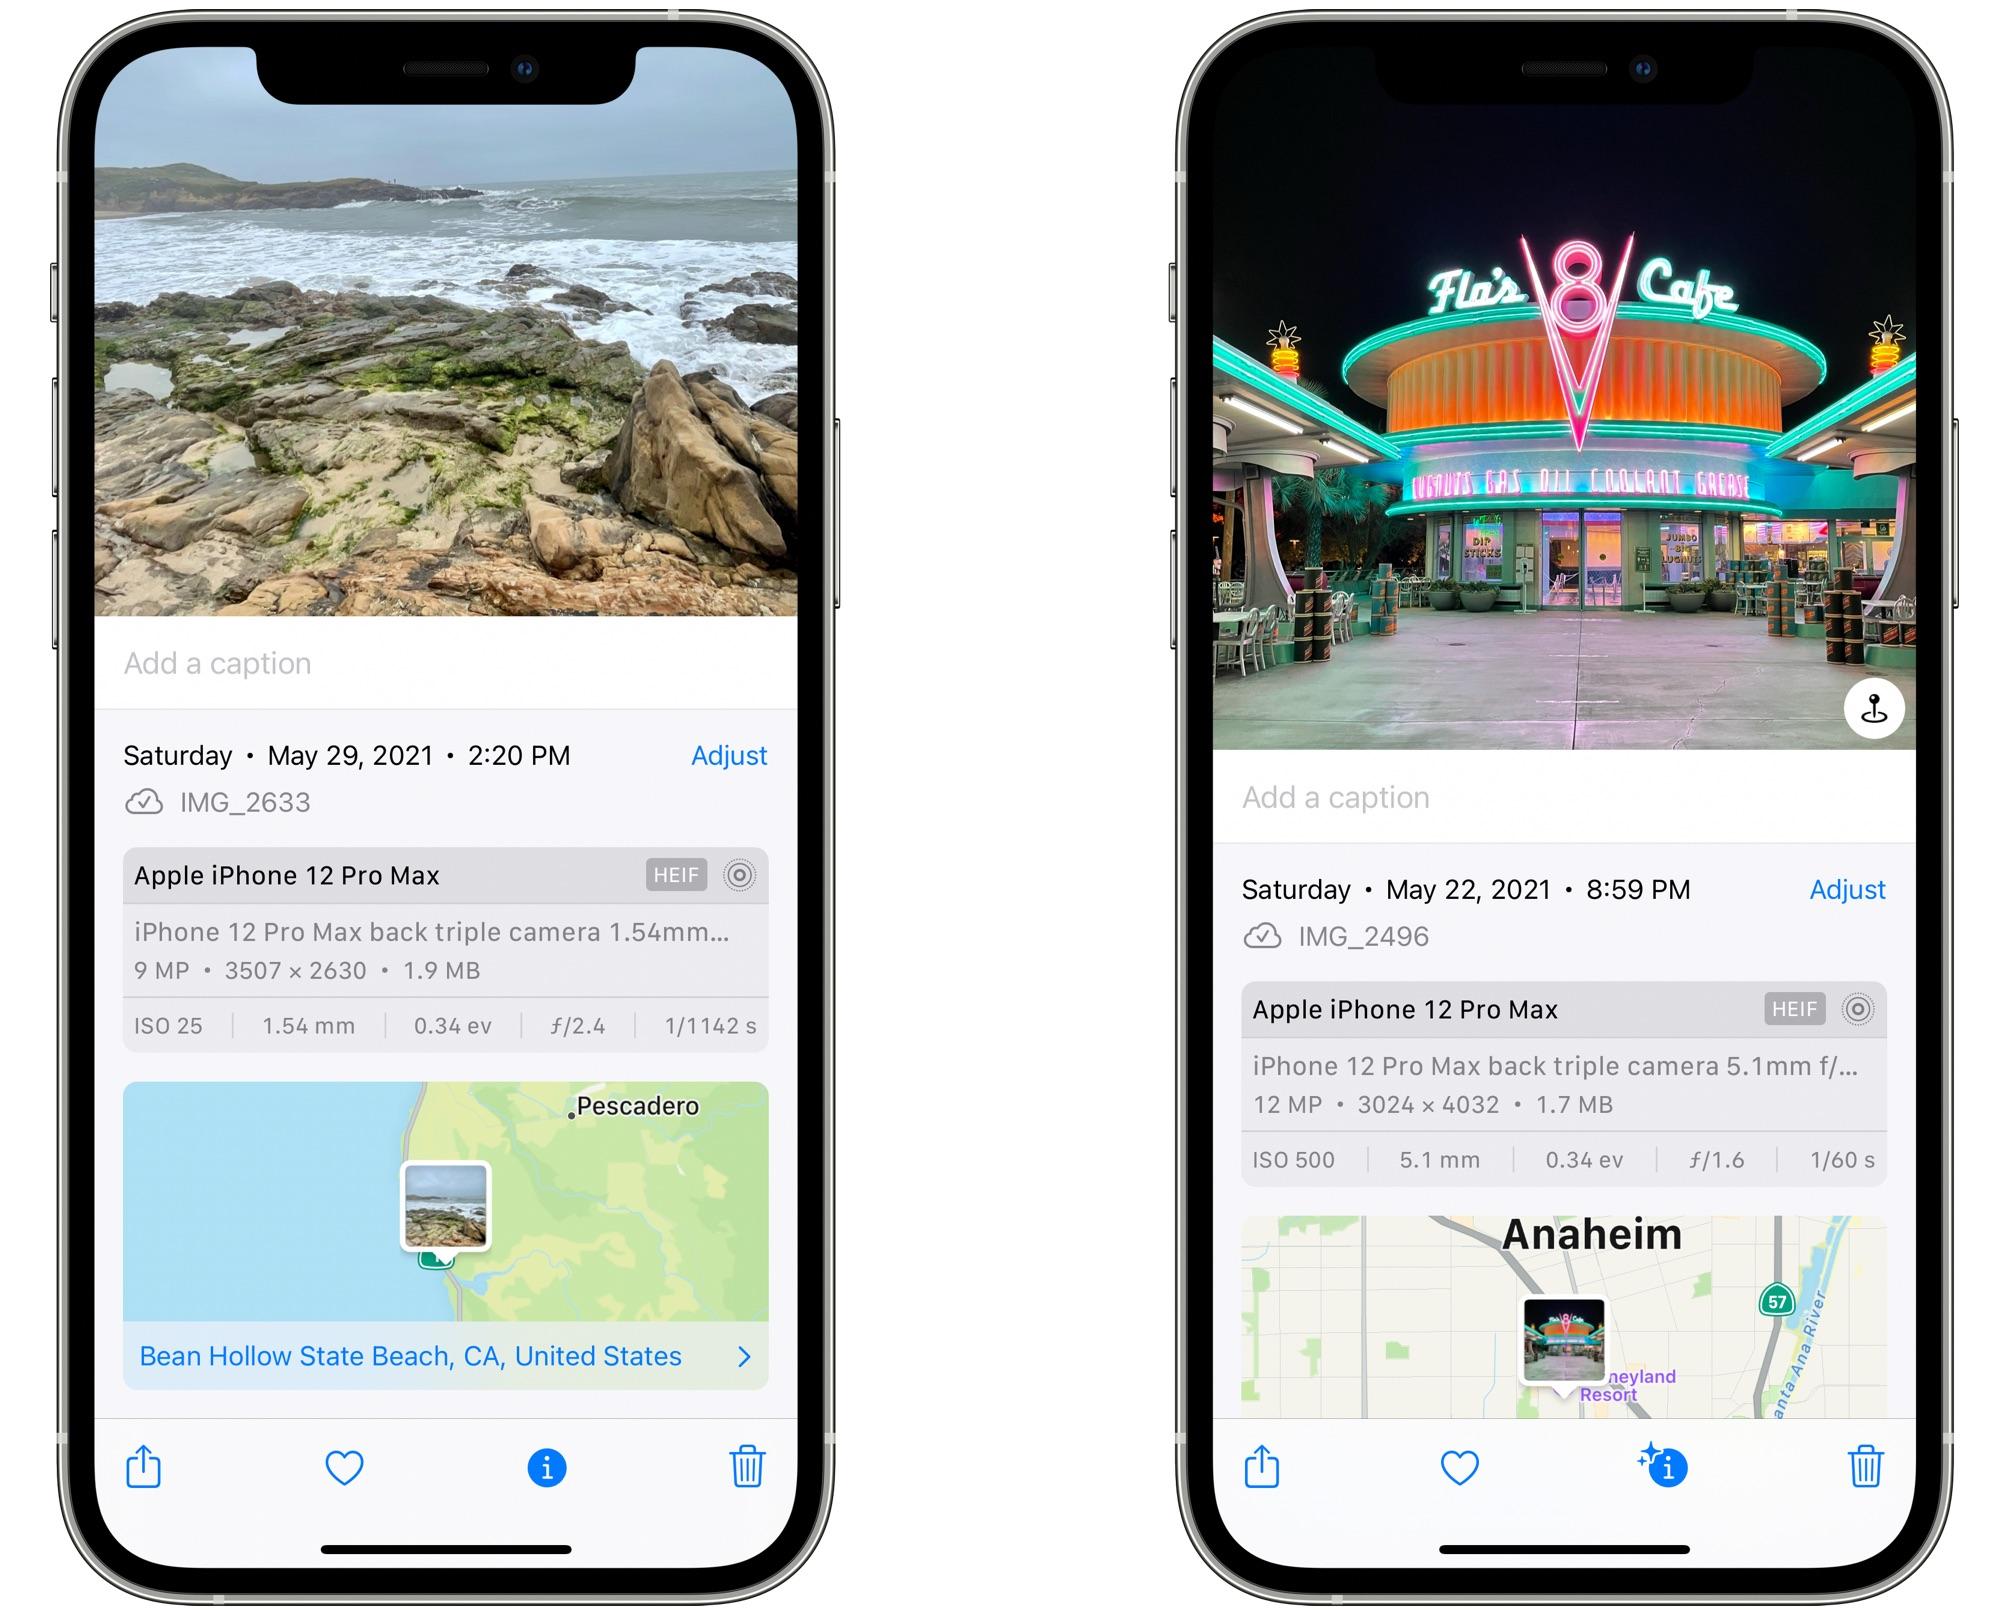 iOS 15 Photos App Now Displays EXIF Metadata for Images